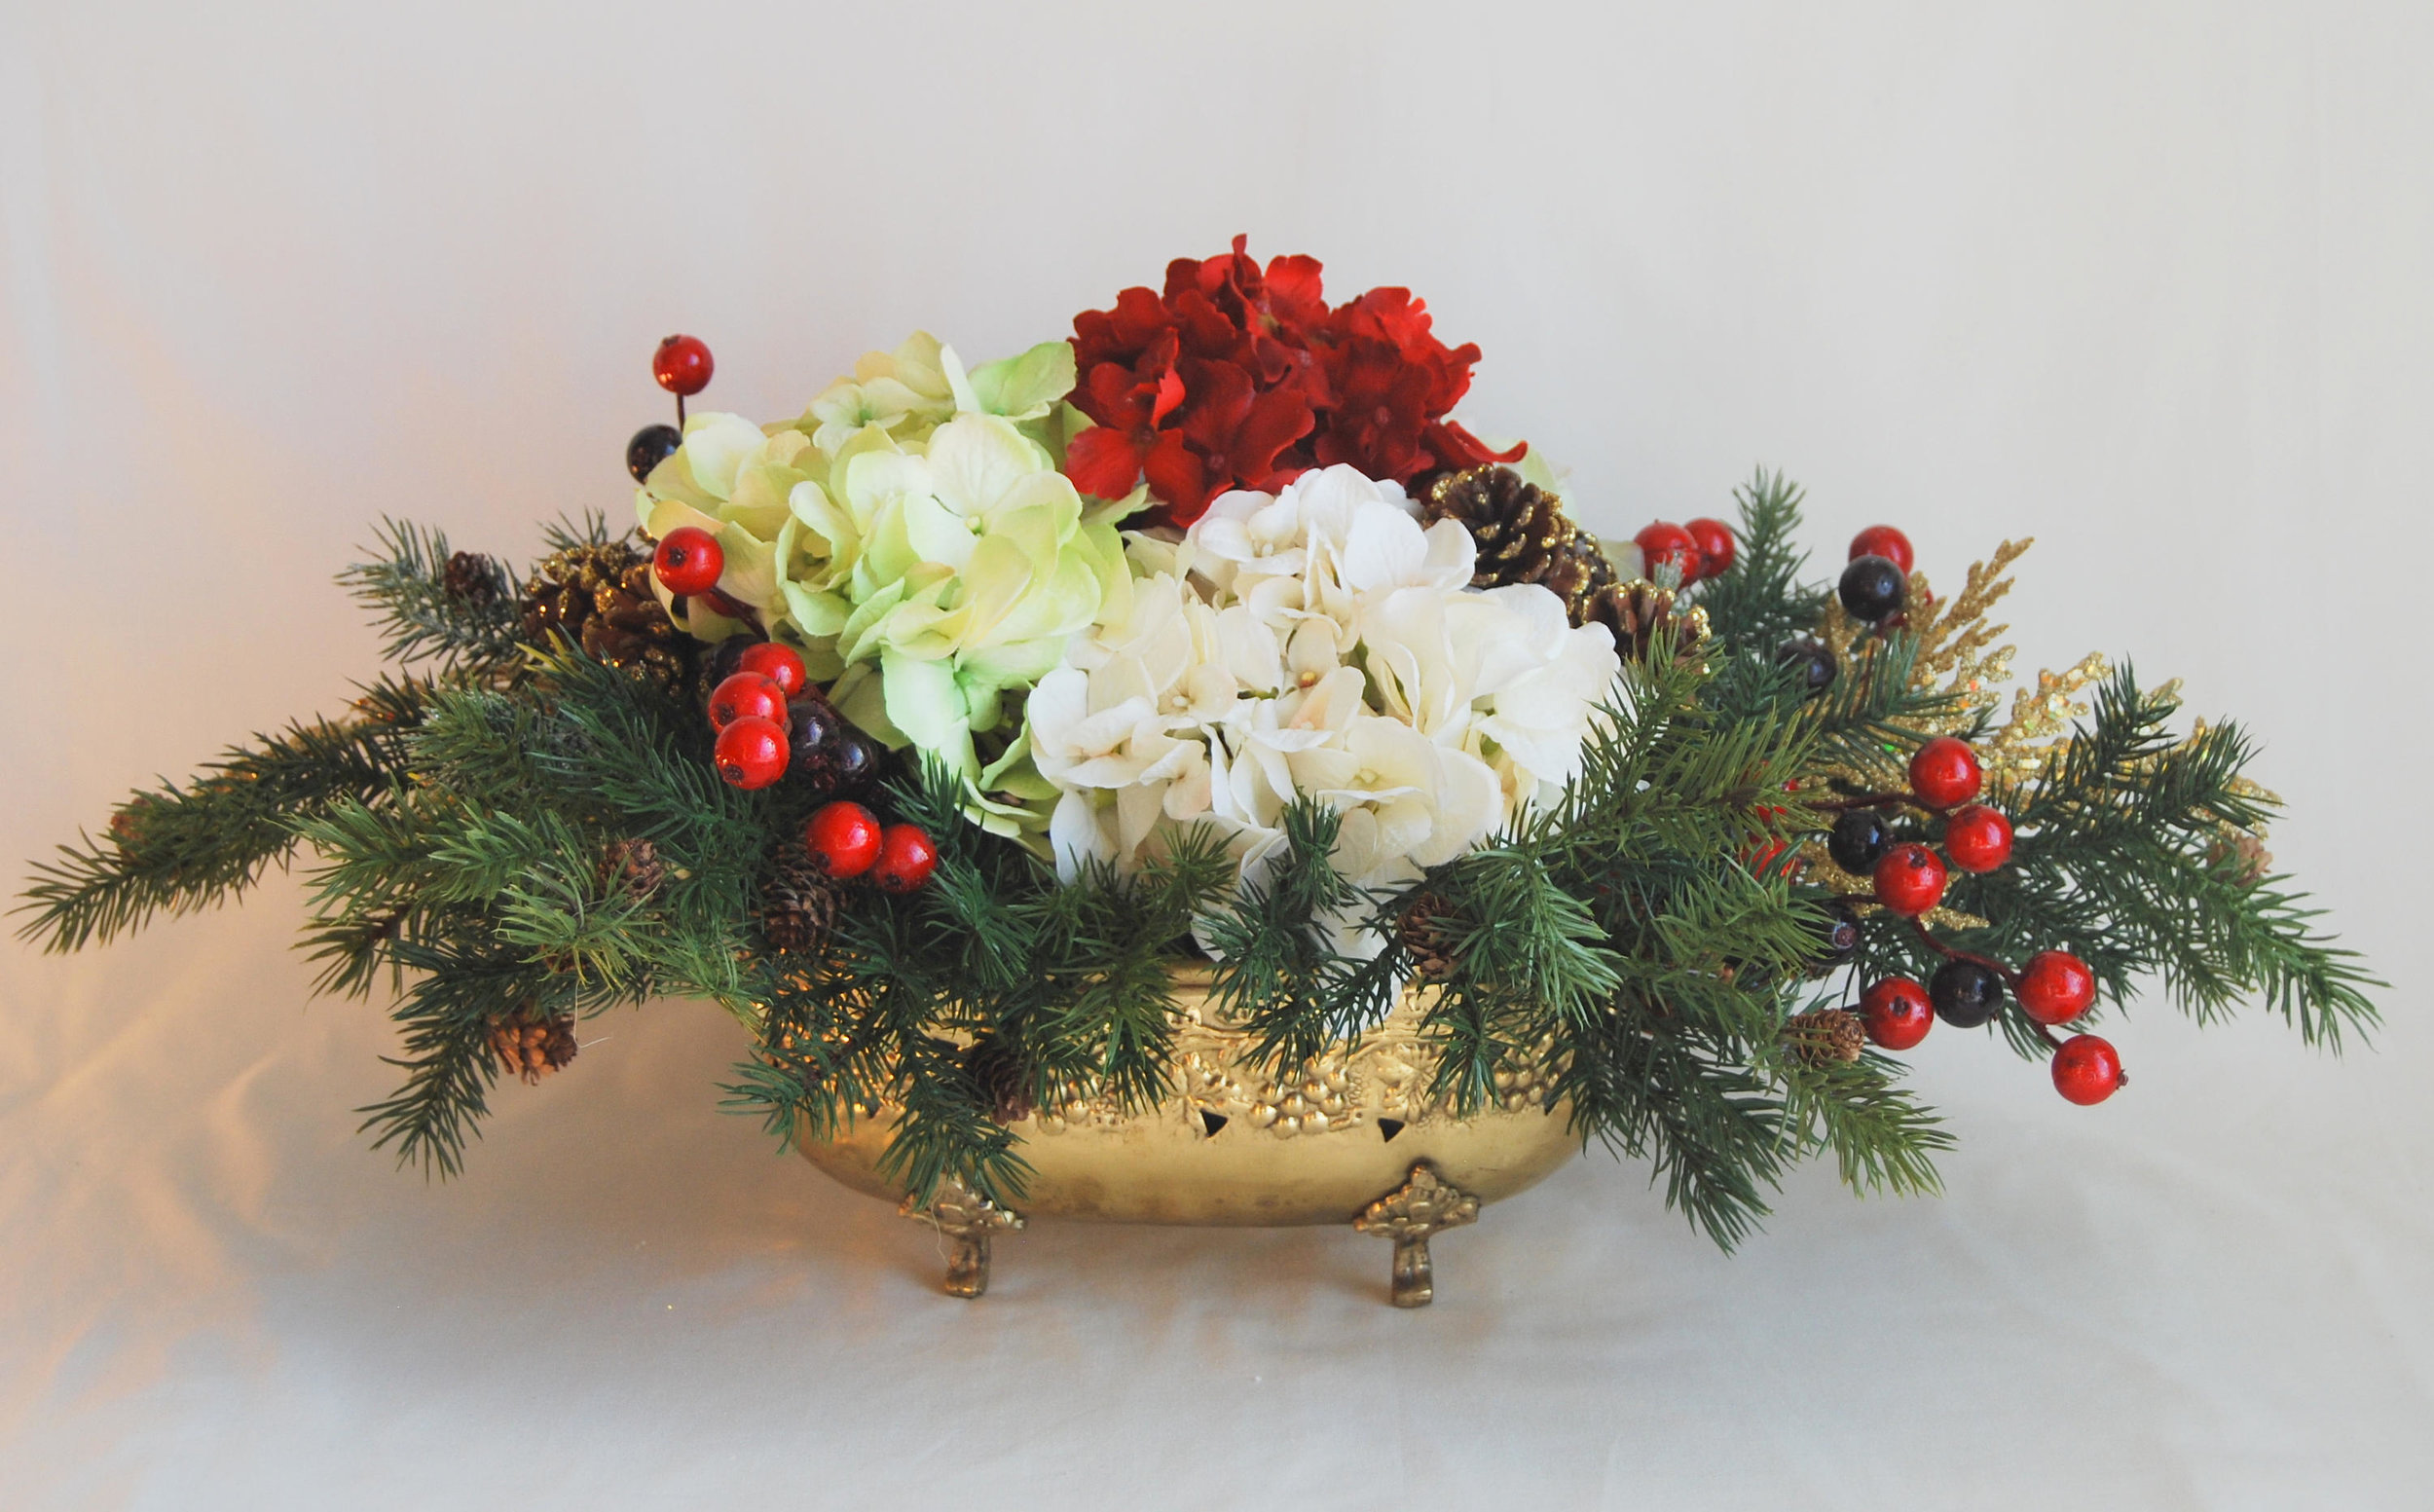 Christmas Flower Arrangements Artificial.Christmas Floral Arrangement Silk Hydrangeas Berries And Evergreens In Brass Vase Floral Designs By Alka